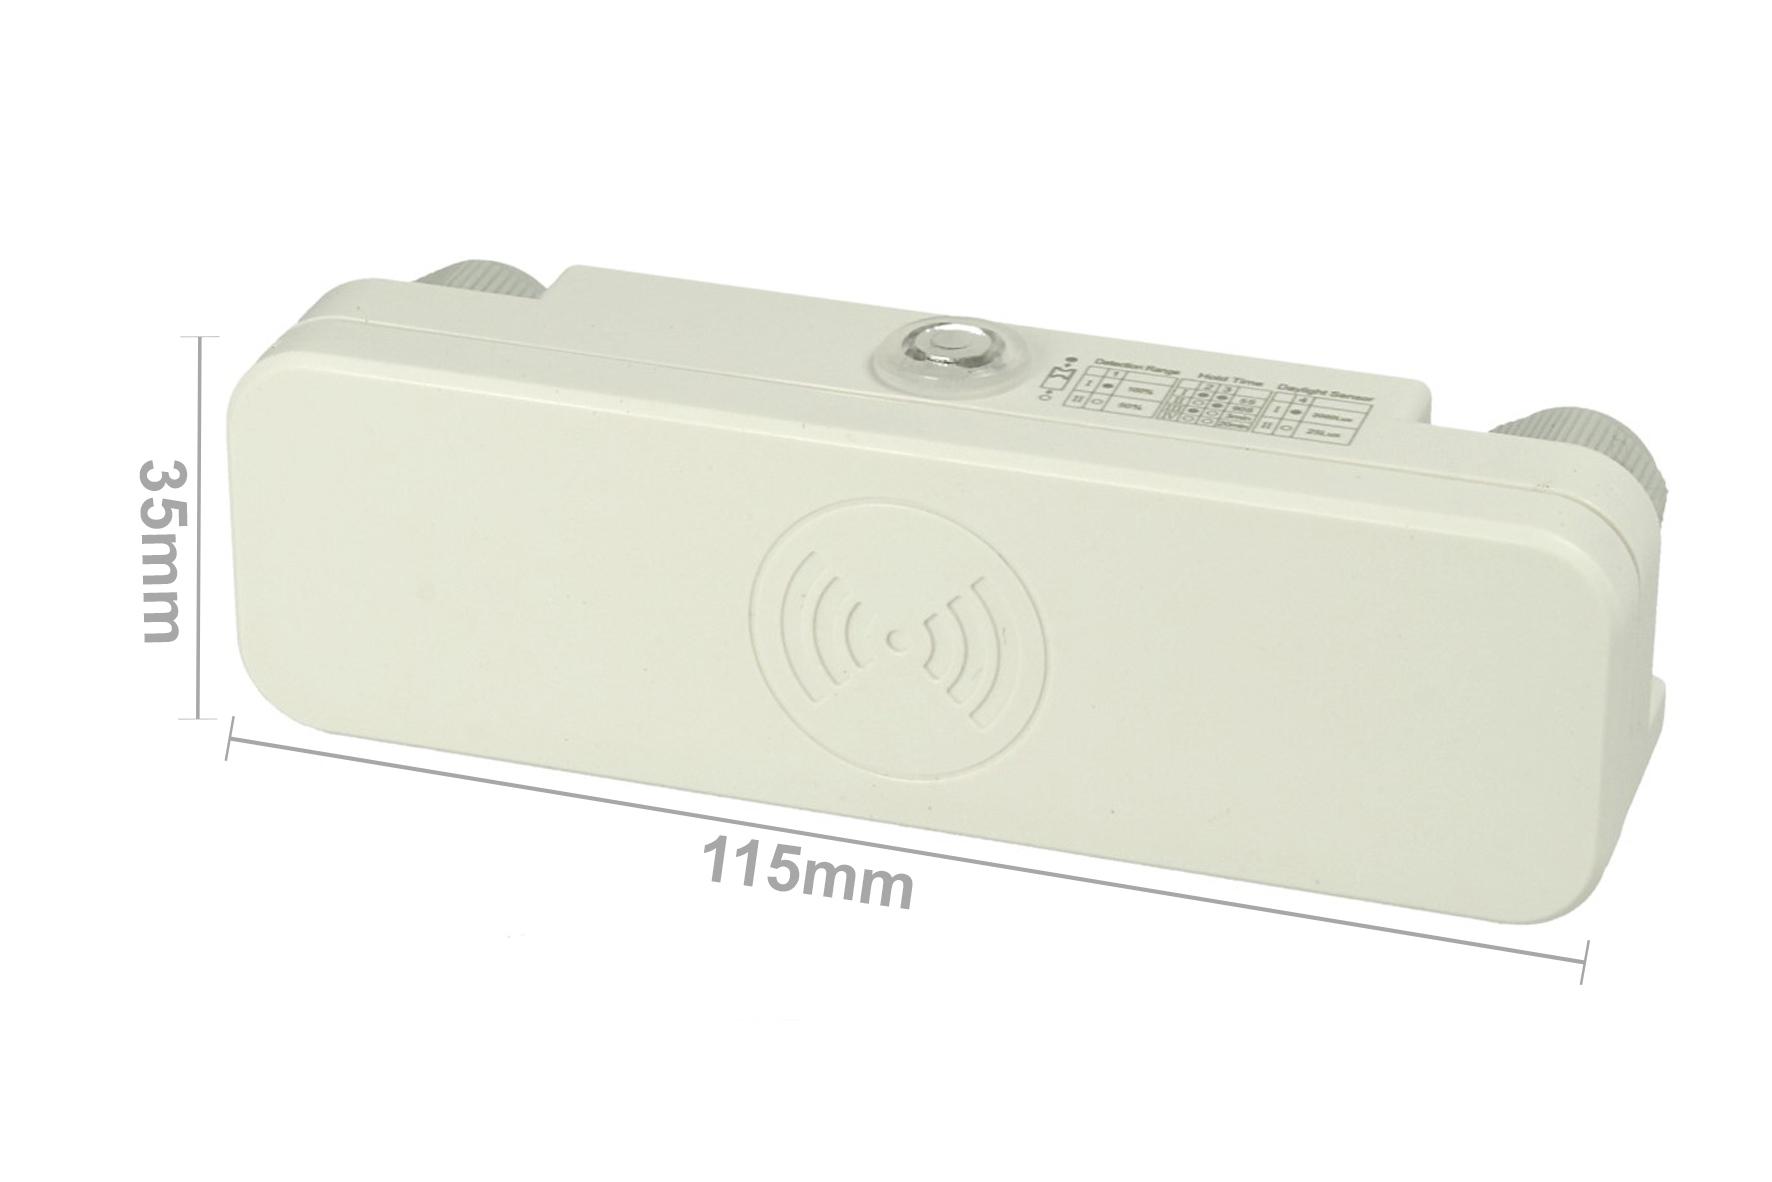 Sensore Microonde Microwave Sensor IP65 220V Max 200W SKU-5571 - KIT